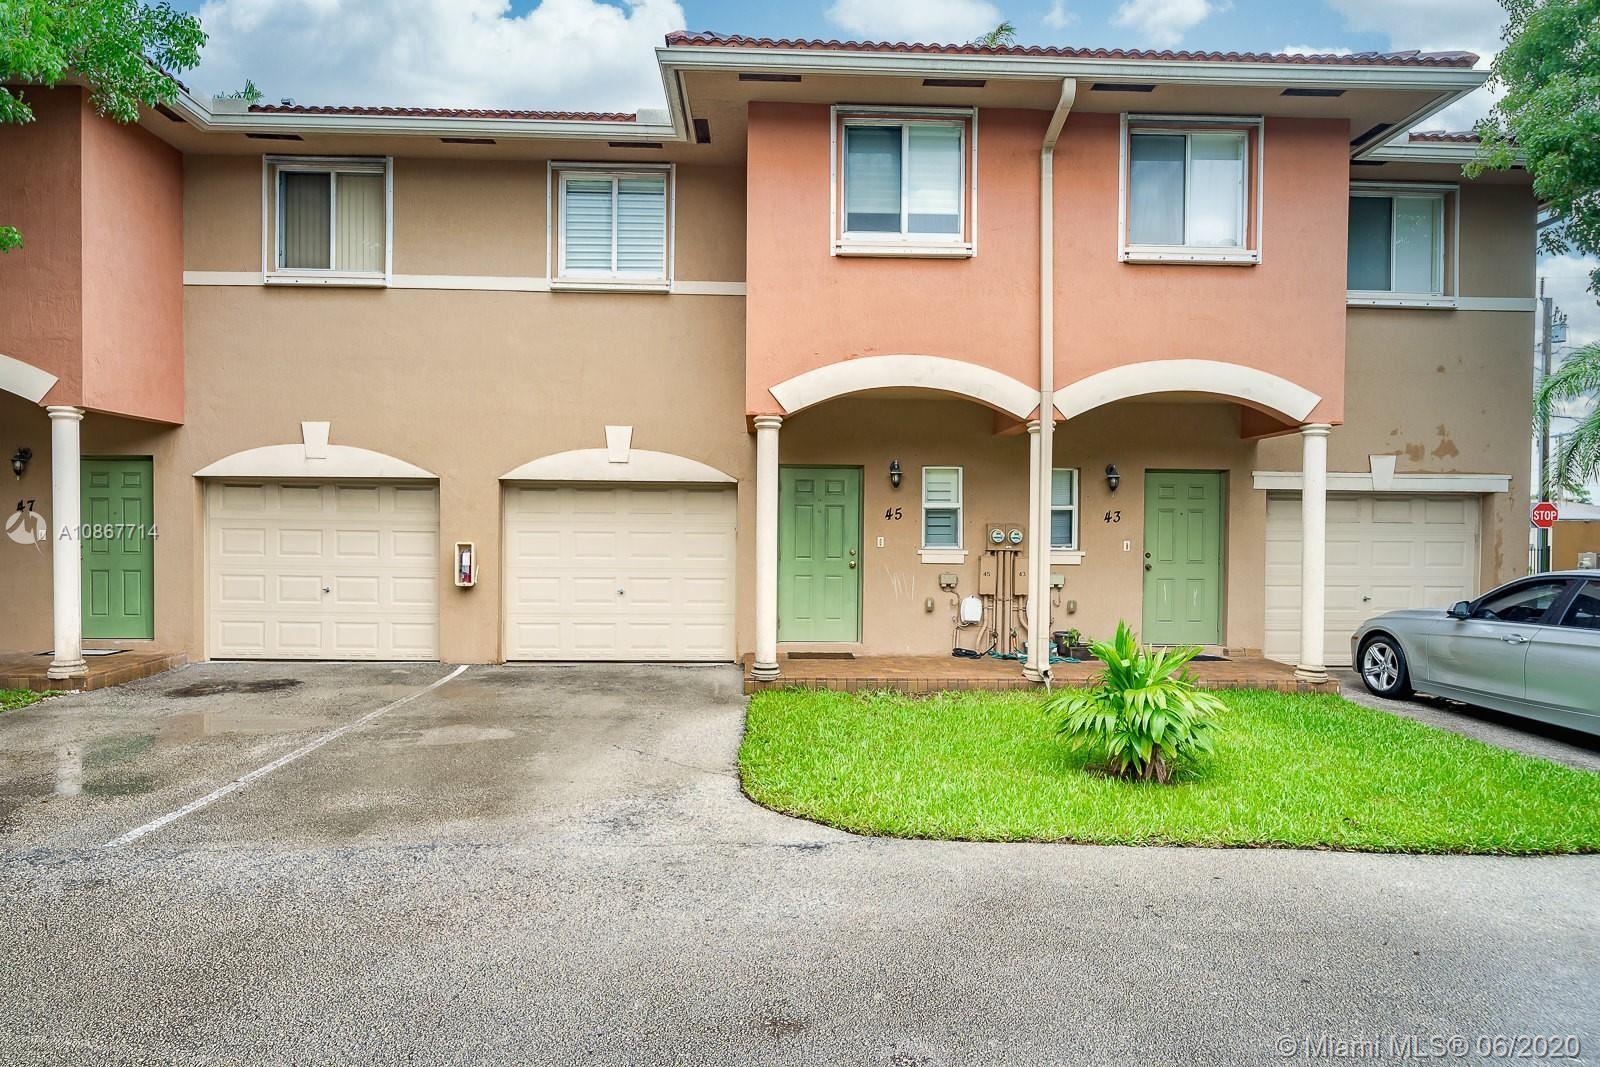 45 SE 3rd Ave #45, Hallandale Beach, FL 33009 - #: A10867714